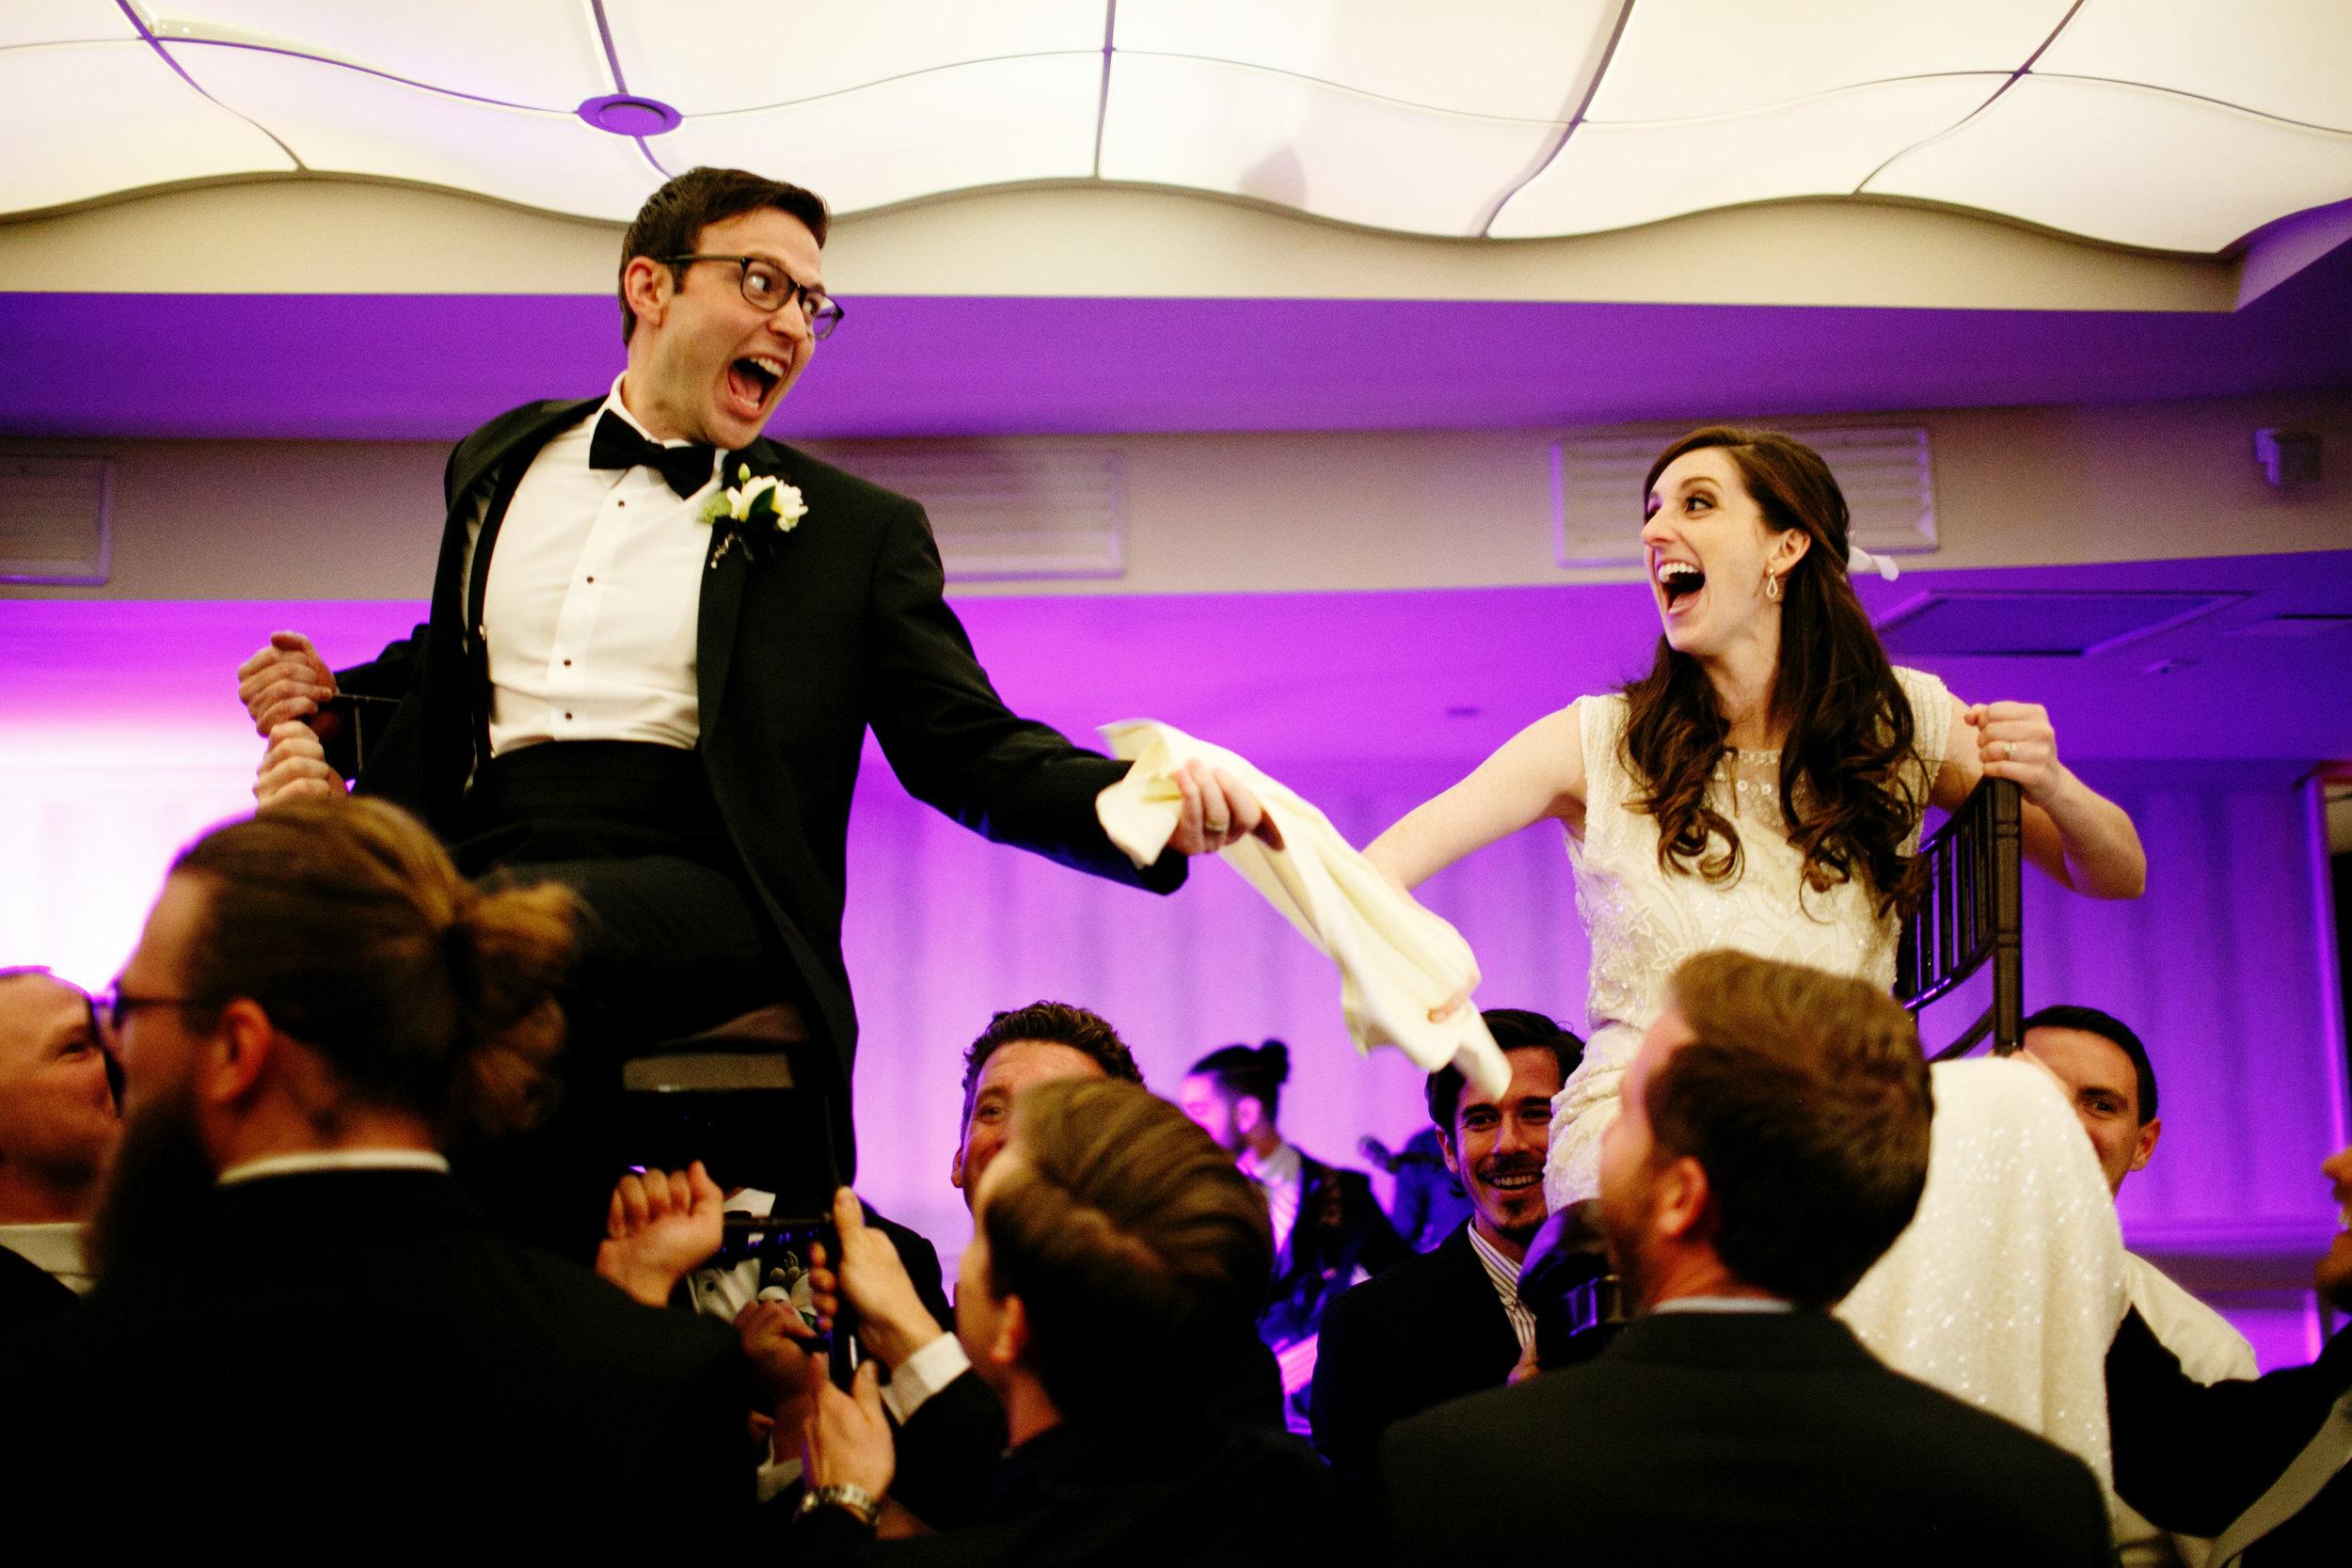 Boston city wedding